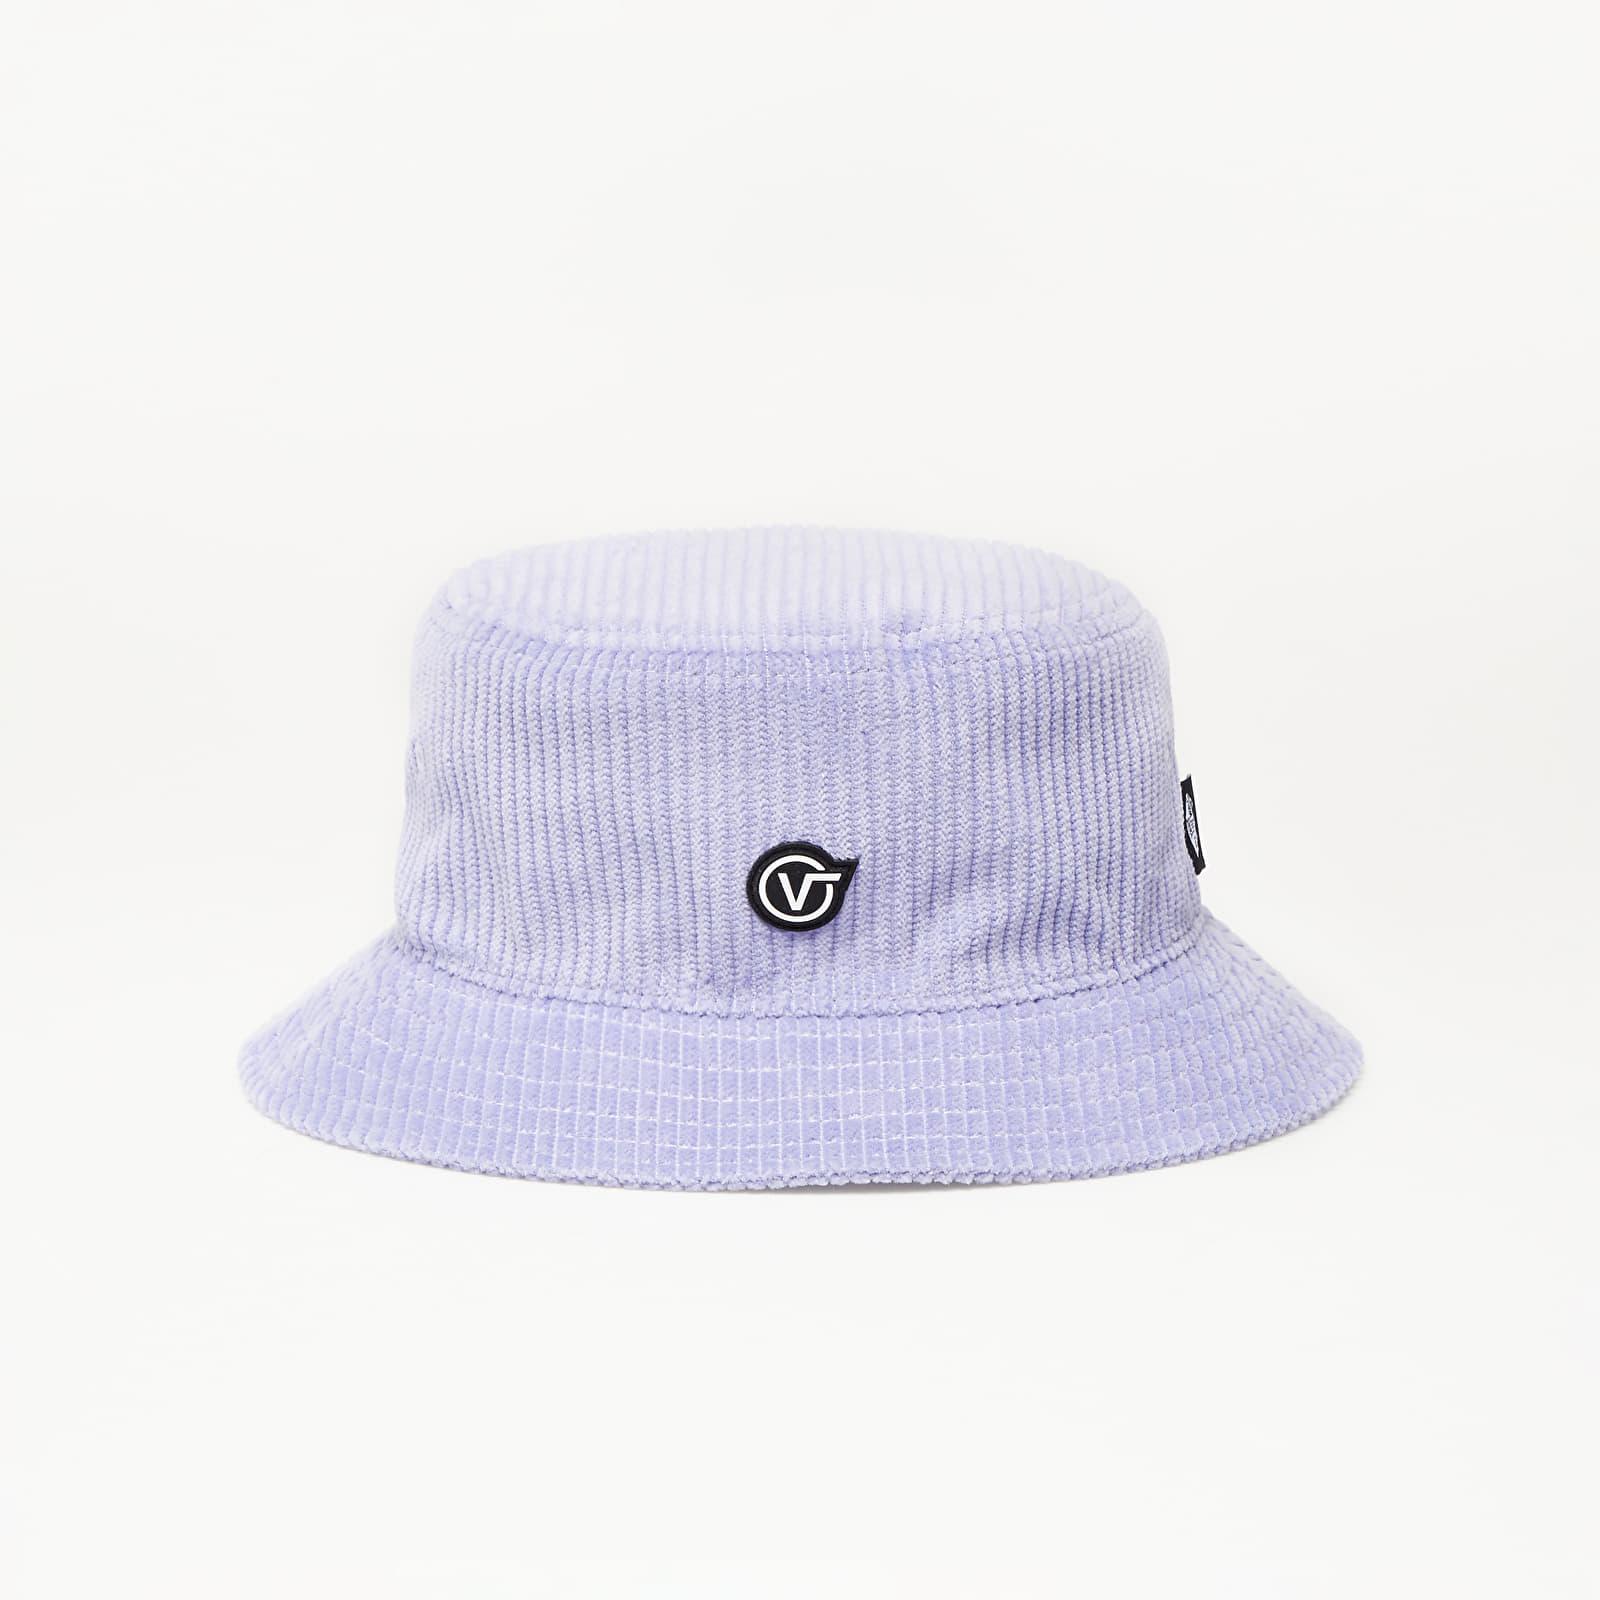 Caps and Hats Vans x Anderson Paak Corduroy Cap Multi